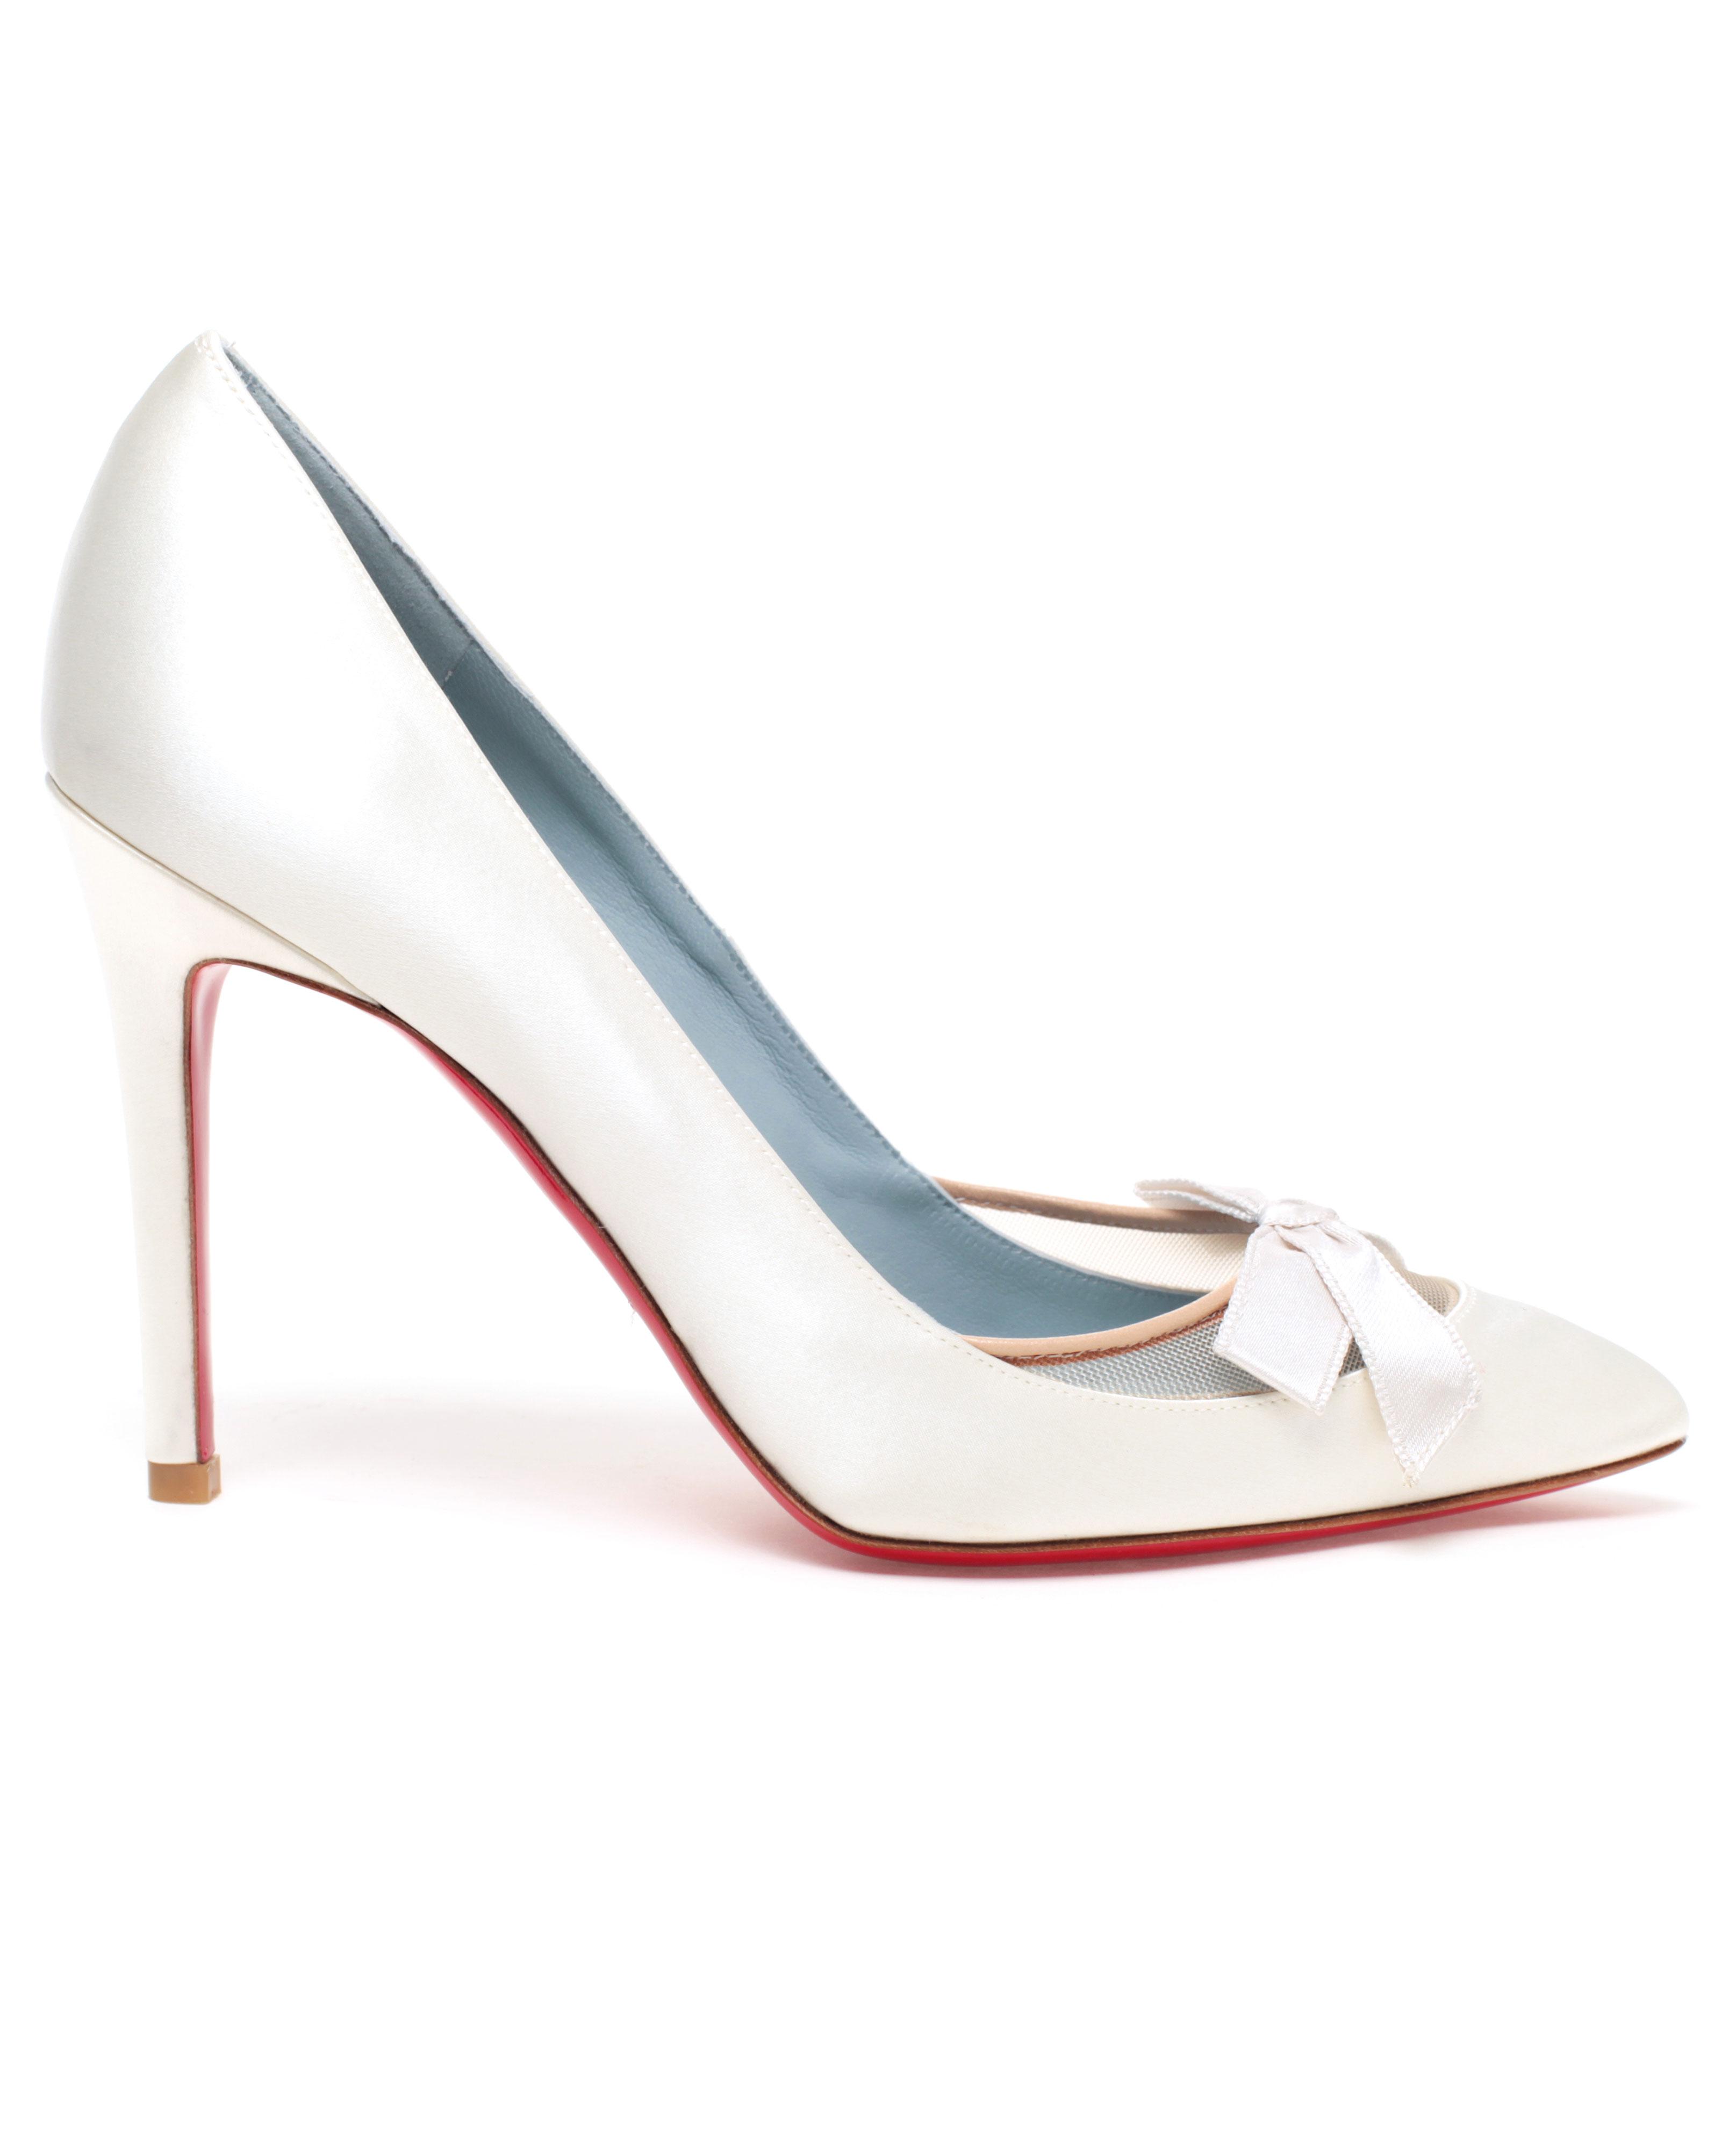 e9ecad5c077 Christian Louboutin Love Me Bridal Shoes in White - Lyst